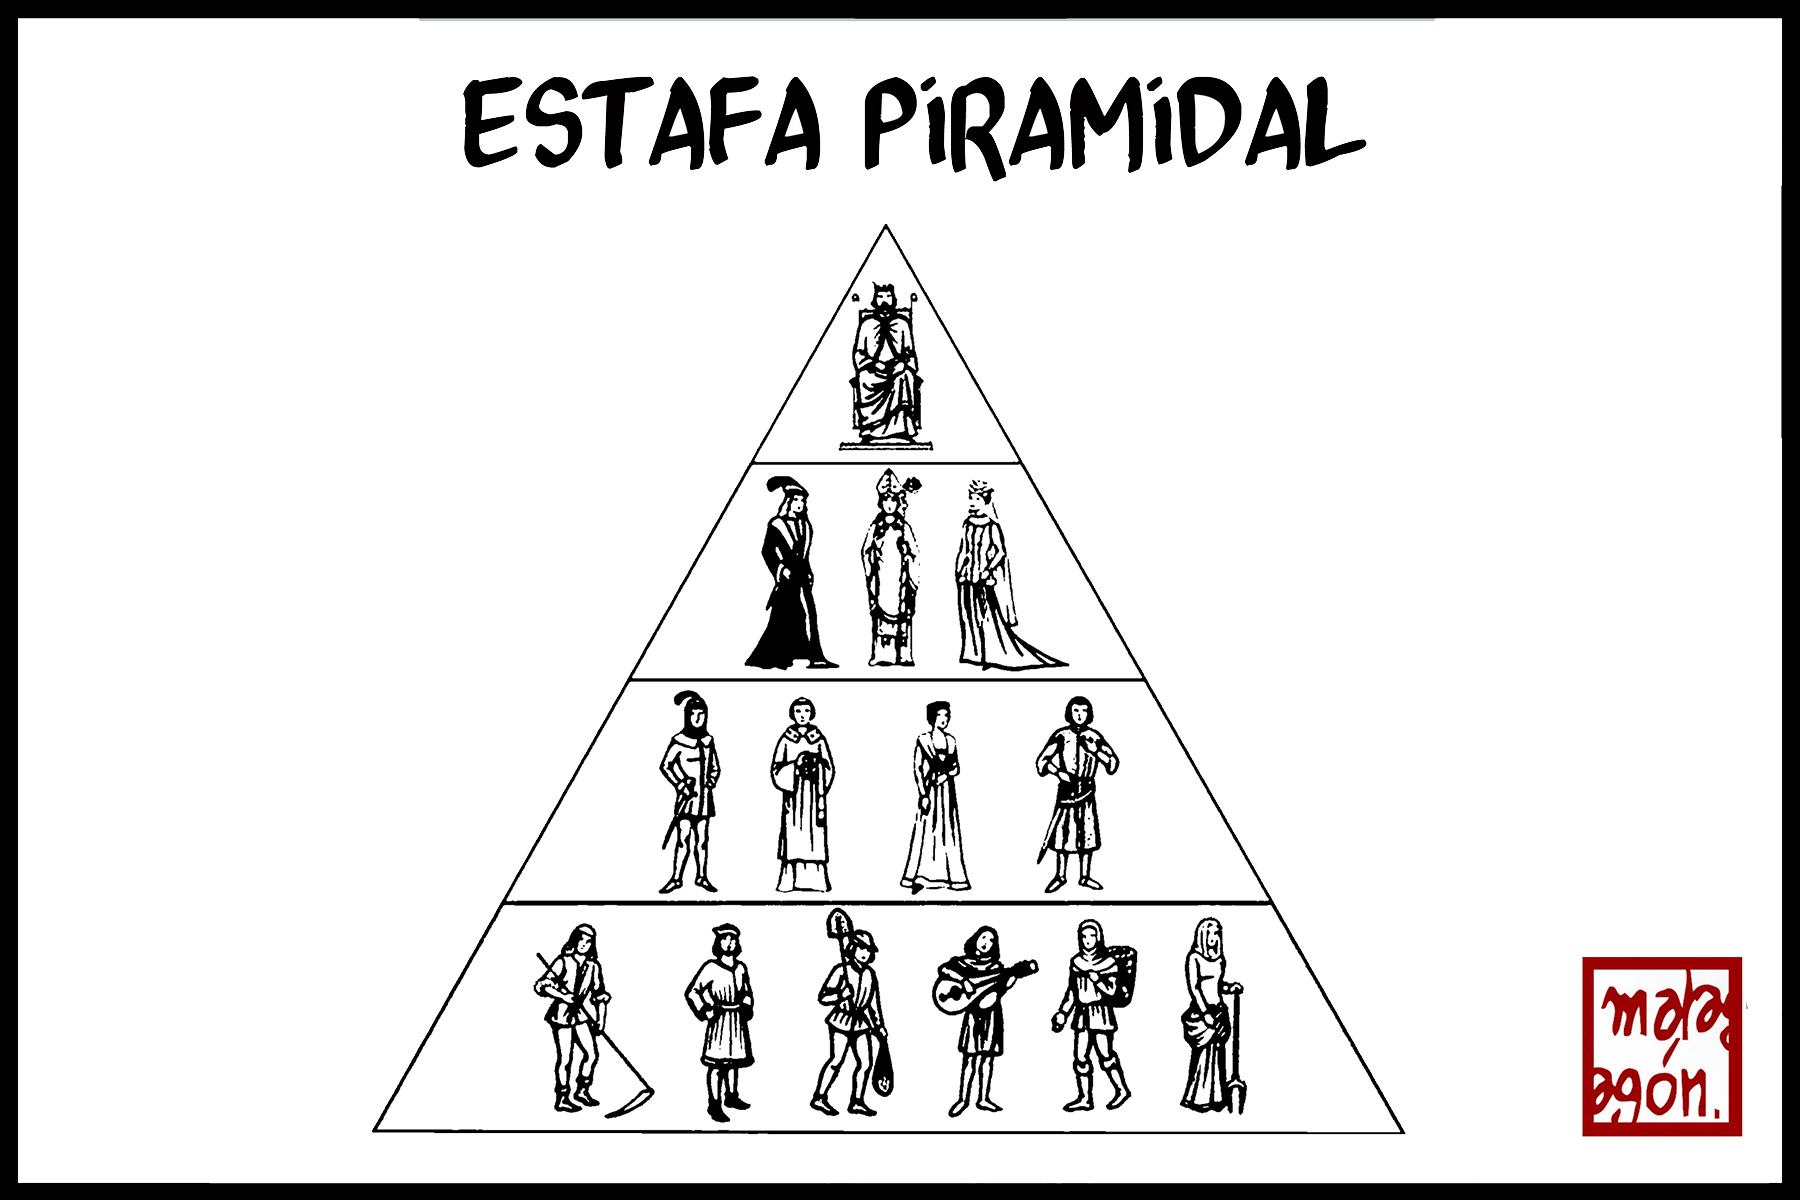 <p>Estafa piramidal.</p>